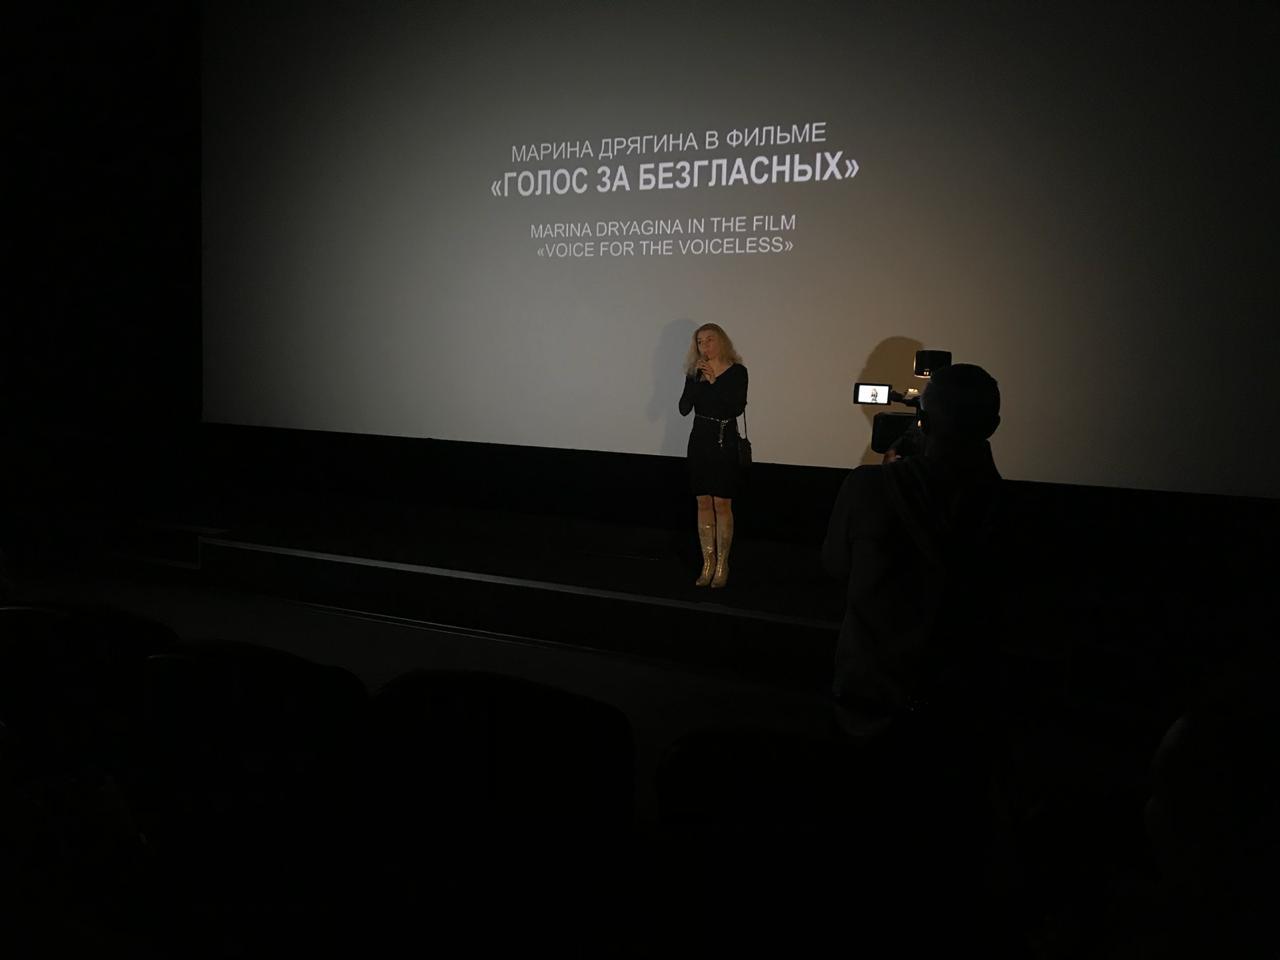 Anna Barsukova cinematographer, documentary film Director, filmmaker